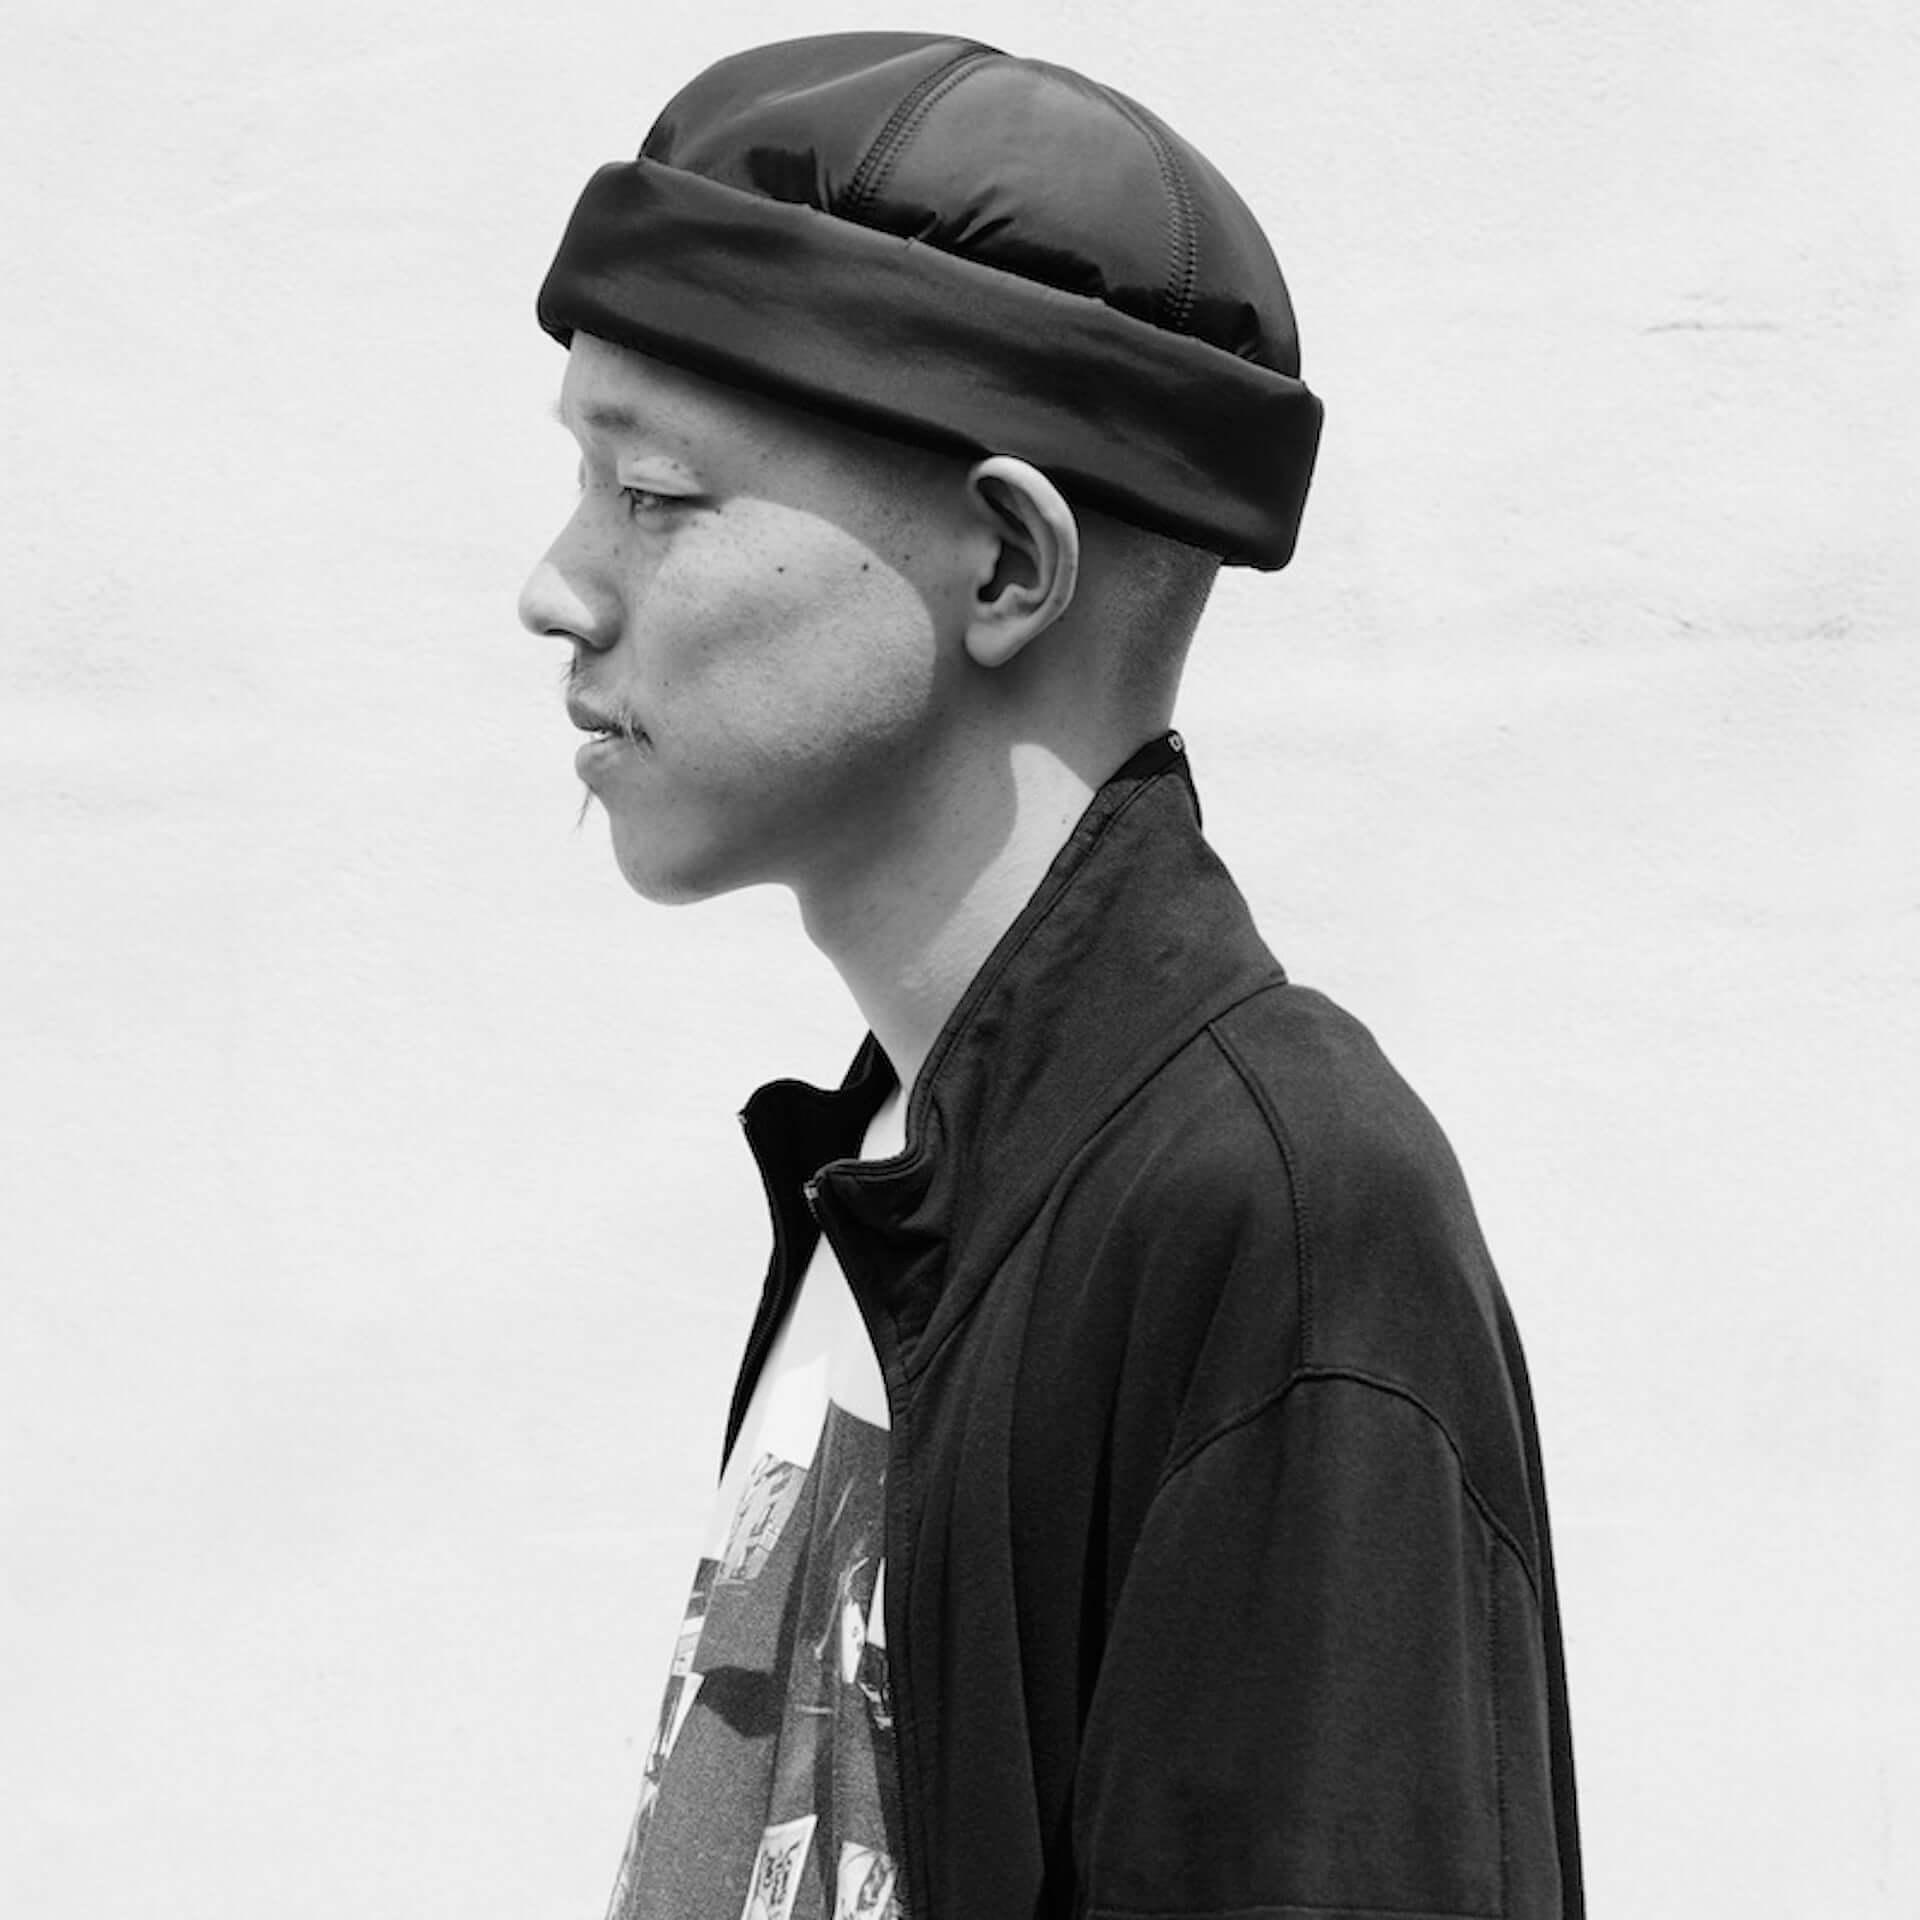 Pioneer DJ『CDJ-3000』のローンチパーティーが渋谷Contactにて明日開催!DJ Nobu、Gonno、SEKITOVA、okadadaらが出演 music201029_contact-cdj3000_7-1920x1920